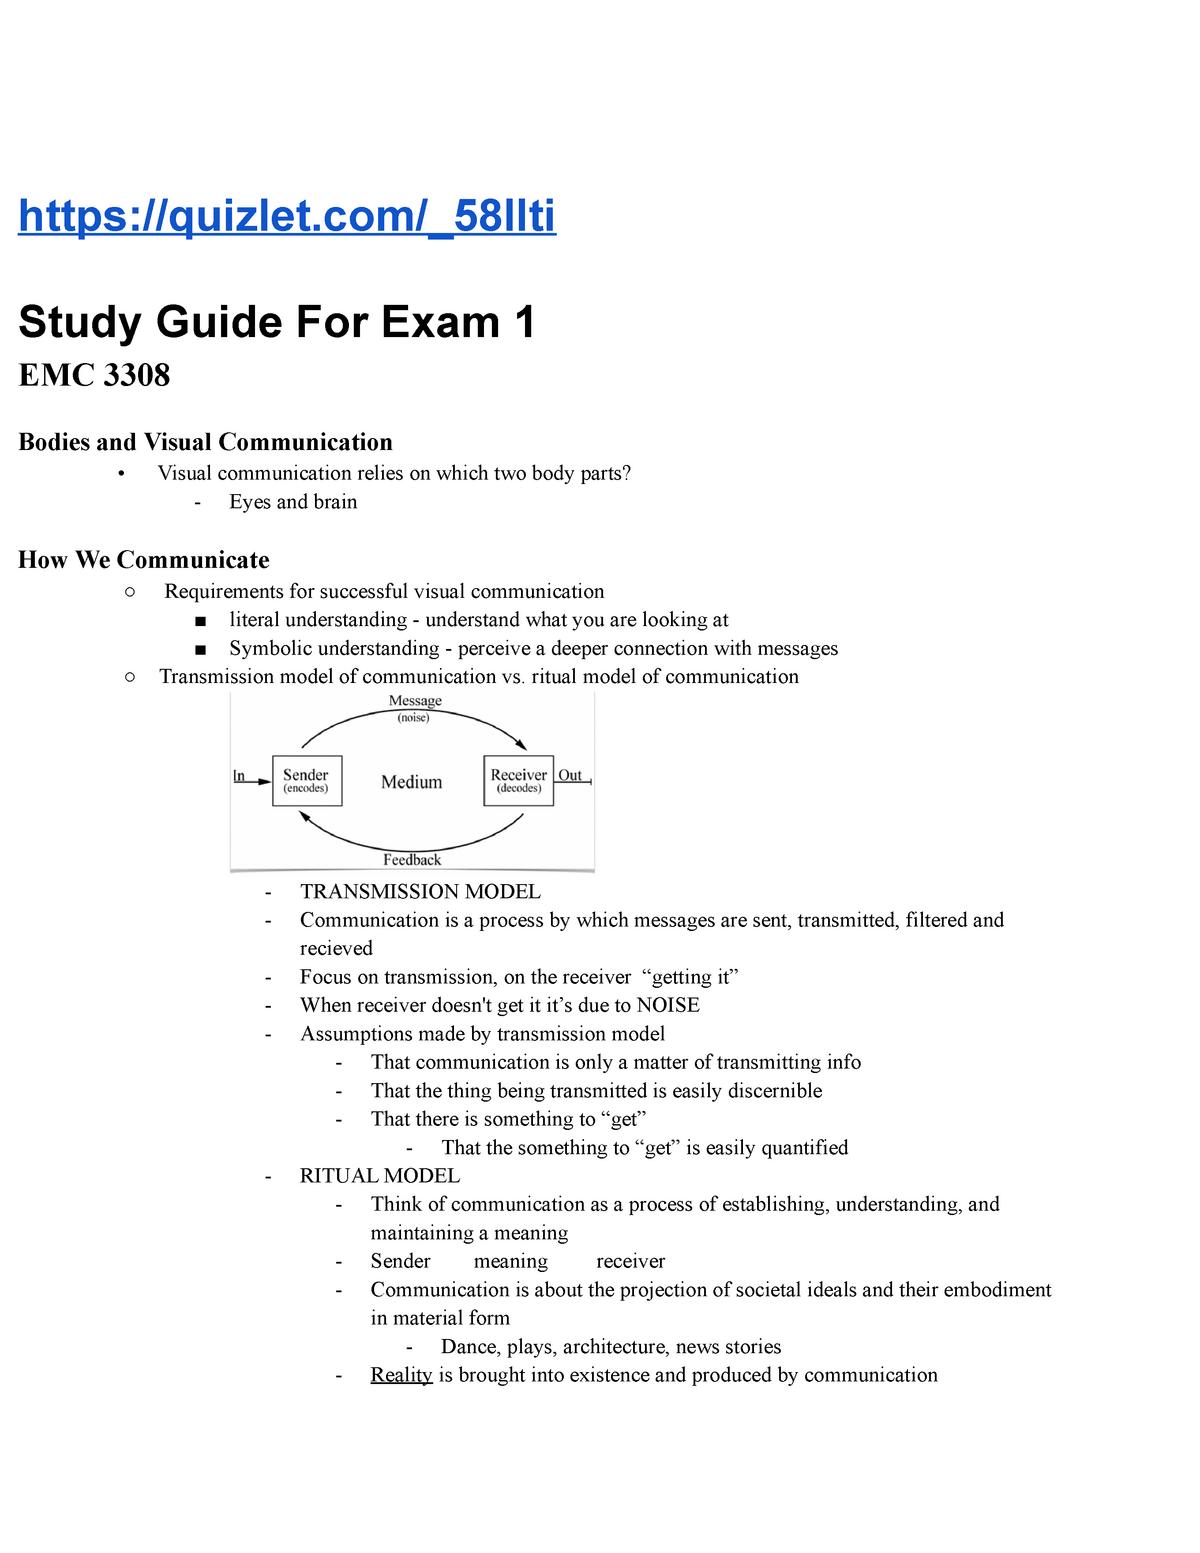 EMC 3308 - Test 1 Review - EMC 3308: Visual Communications